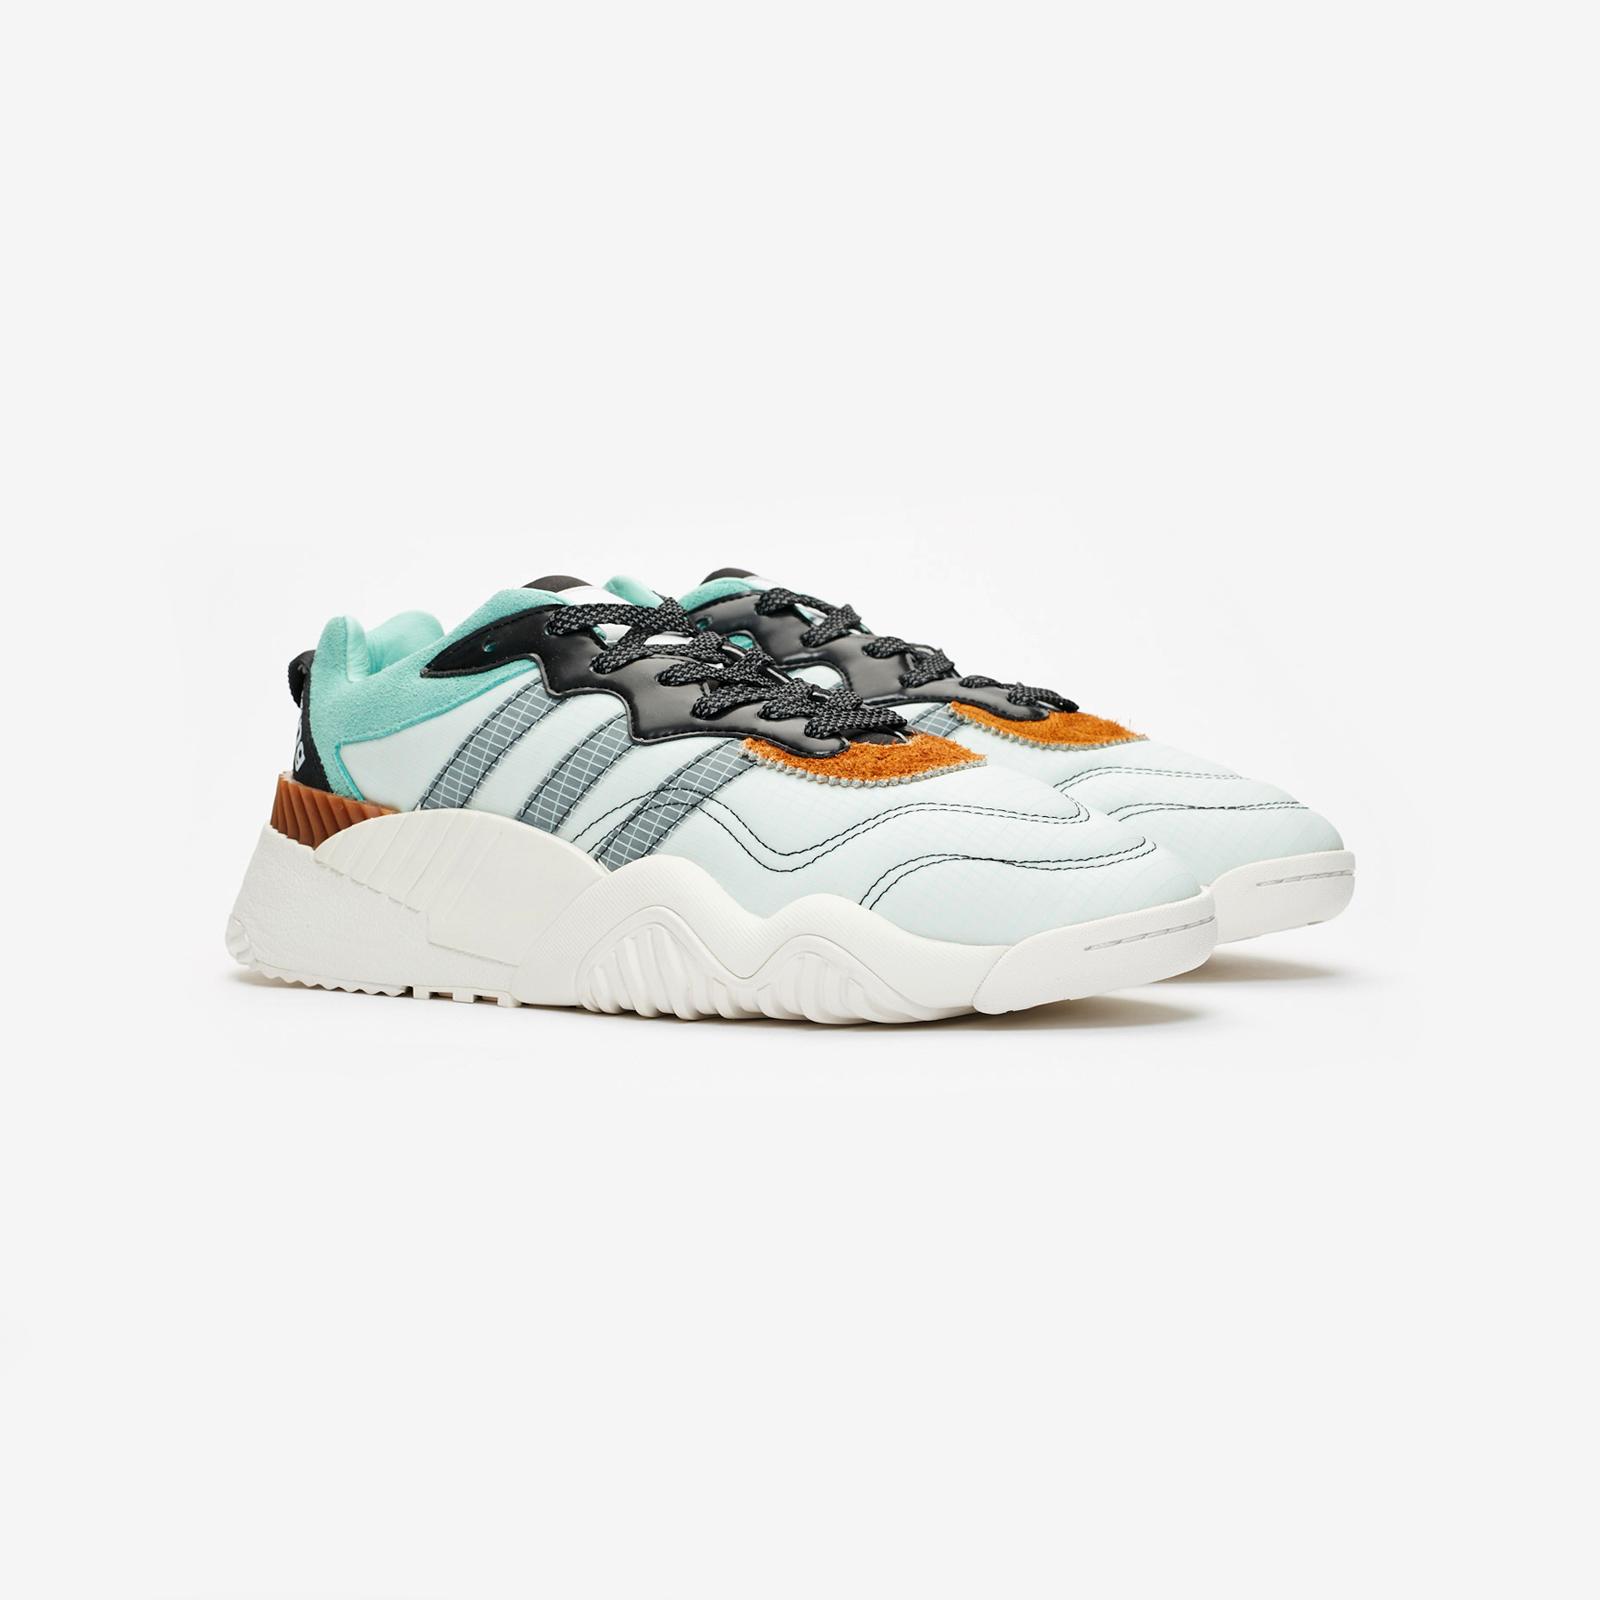 0855cfb8e5751 adidas Originals by Alexander Wang AW Turnout Trainer